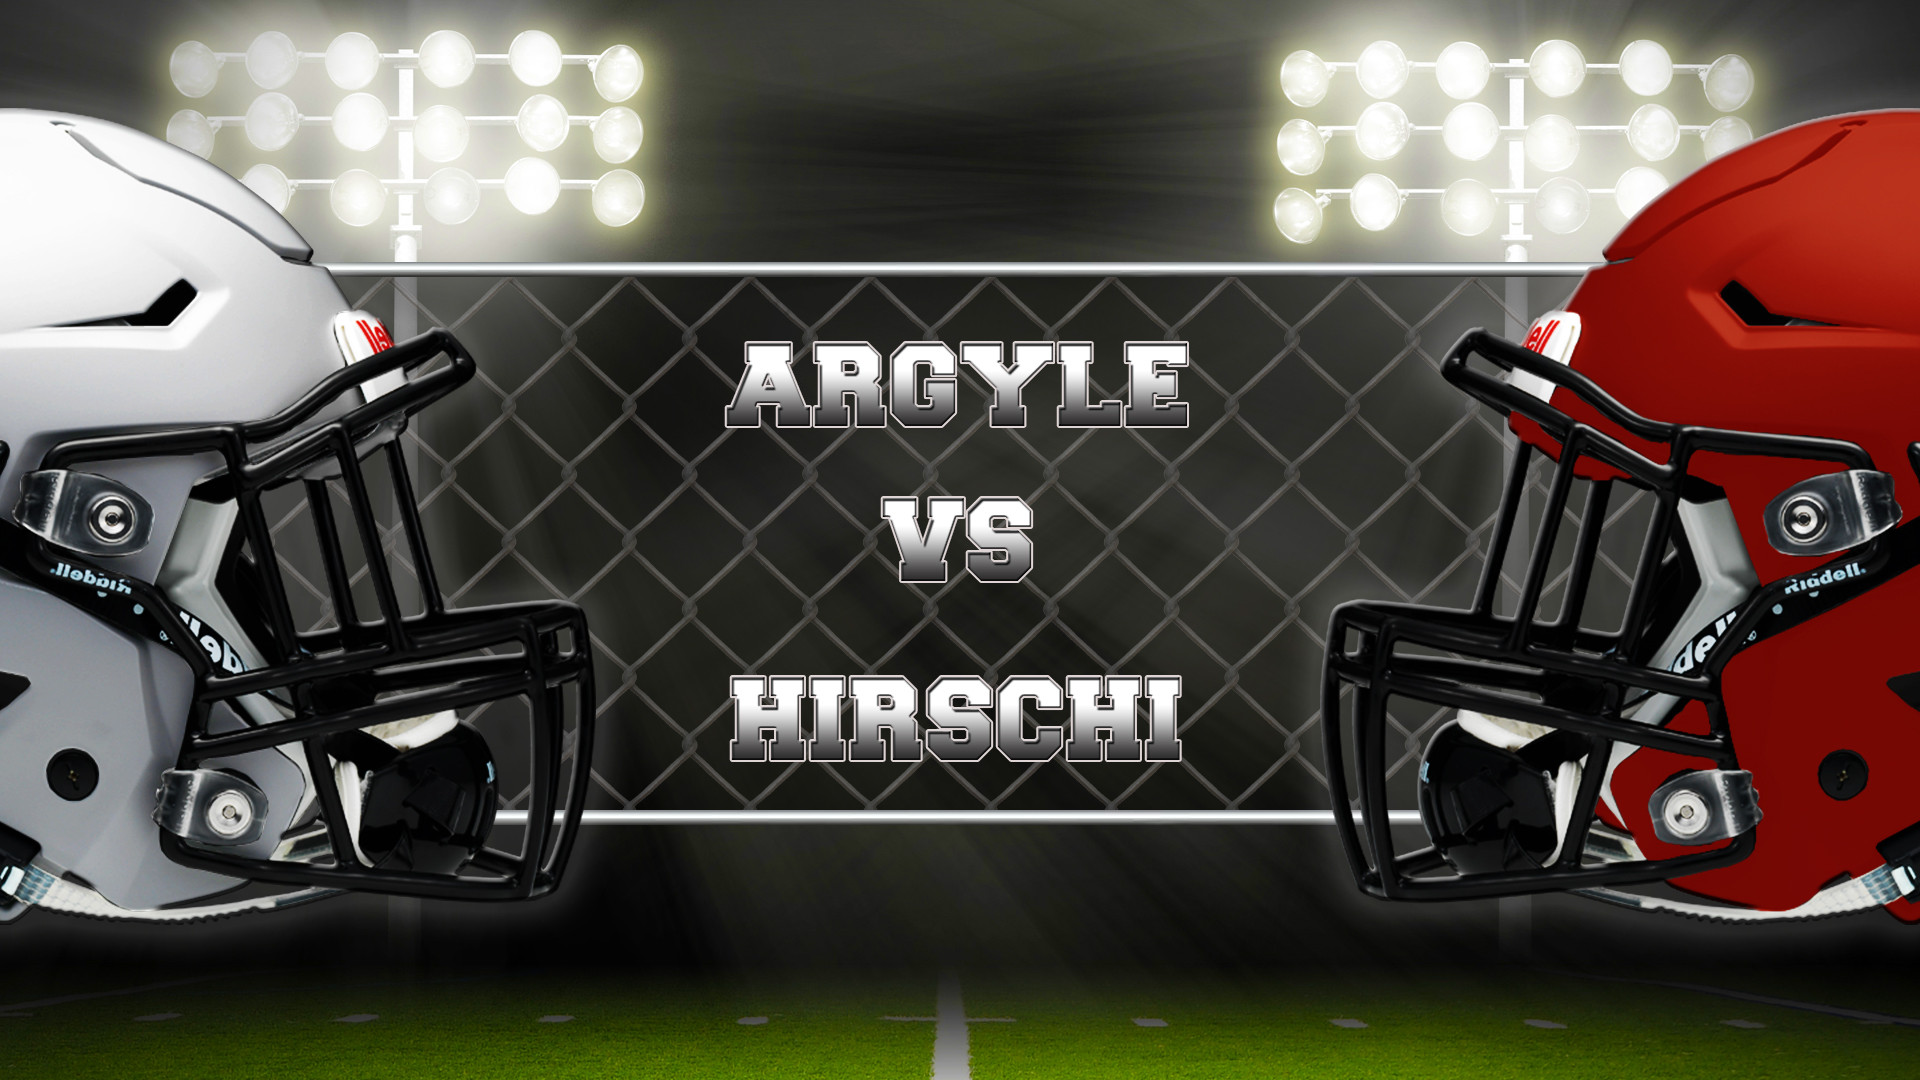 Argyle vs Hirschi_1477661492494.jpg